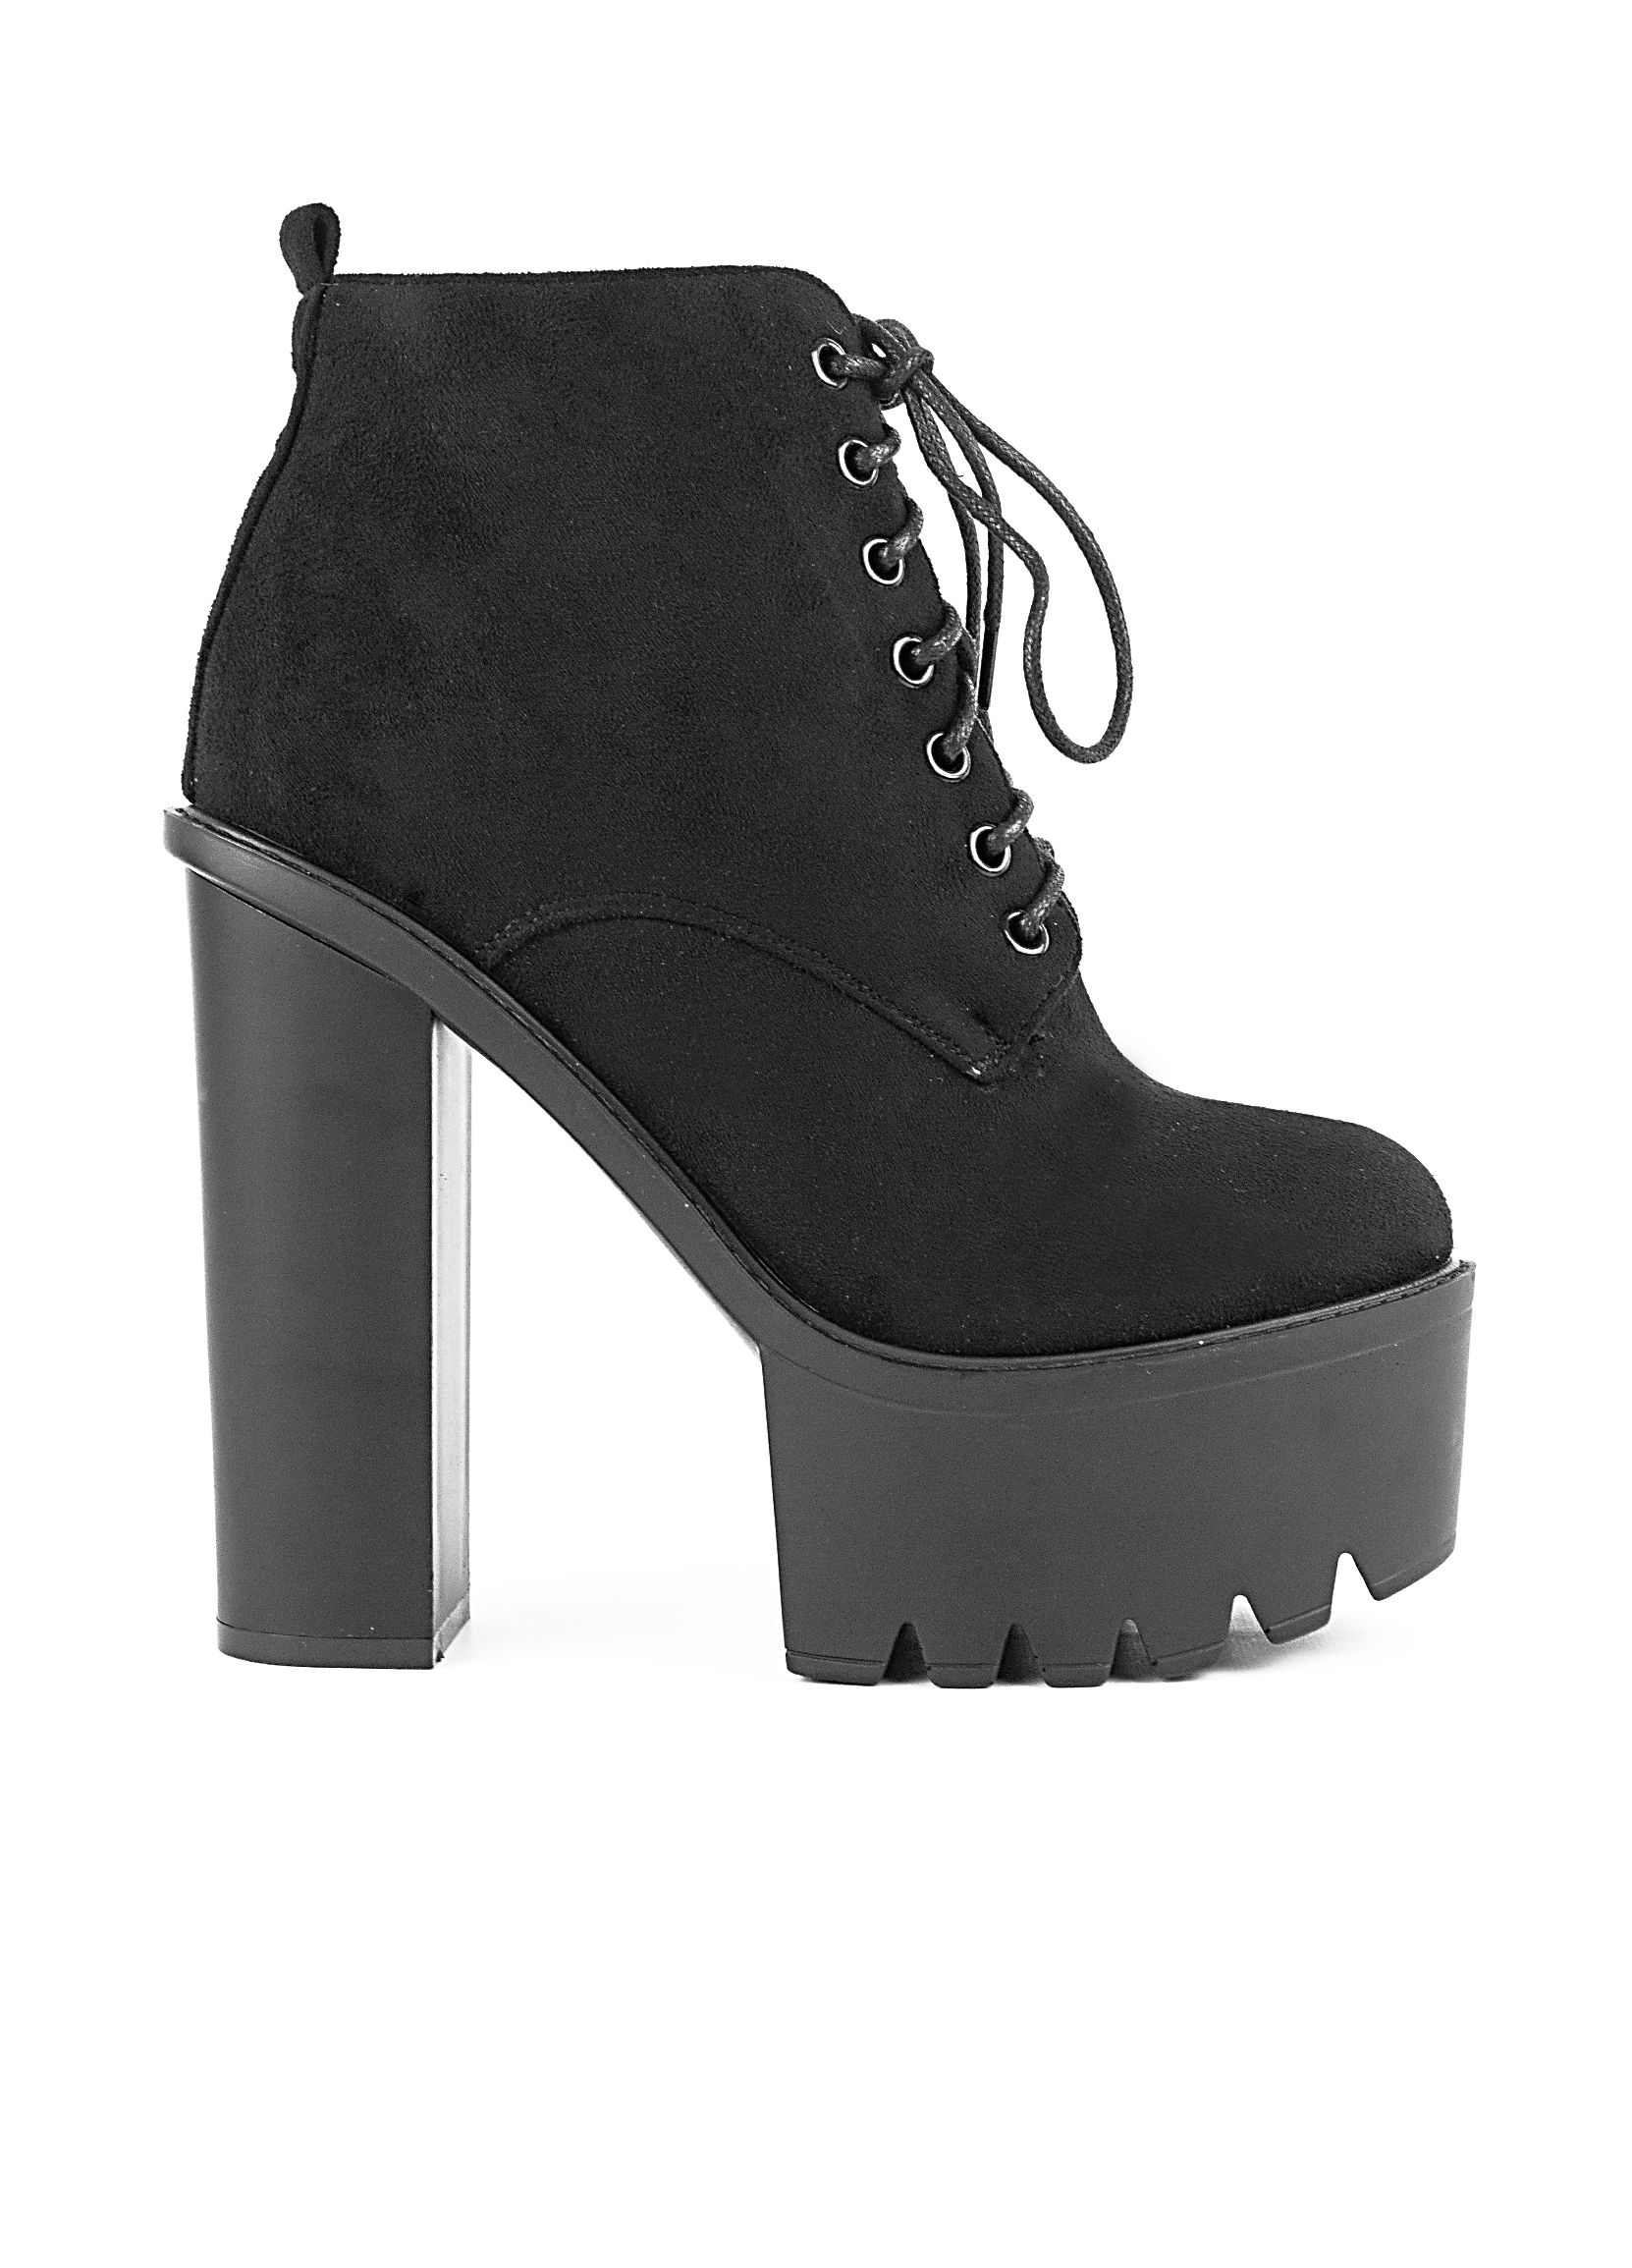 255f85e74c6 Μποτάκια Tracksole Suede-Μαύρο - ΓΥΝΑΙΚΕΙΑ ΠΑΠΟΥΤΣΙΑ - LUIGI FOOTWEAR